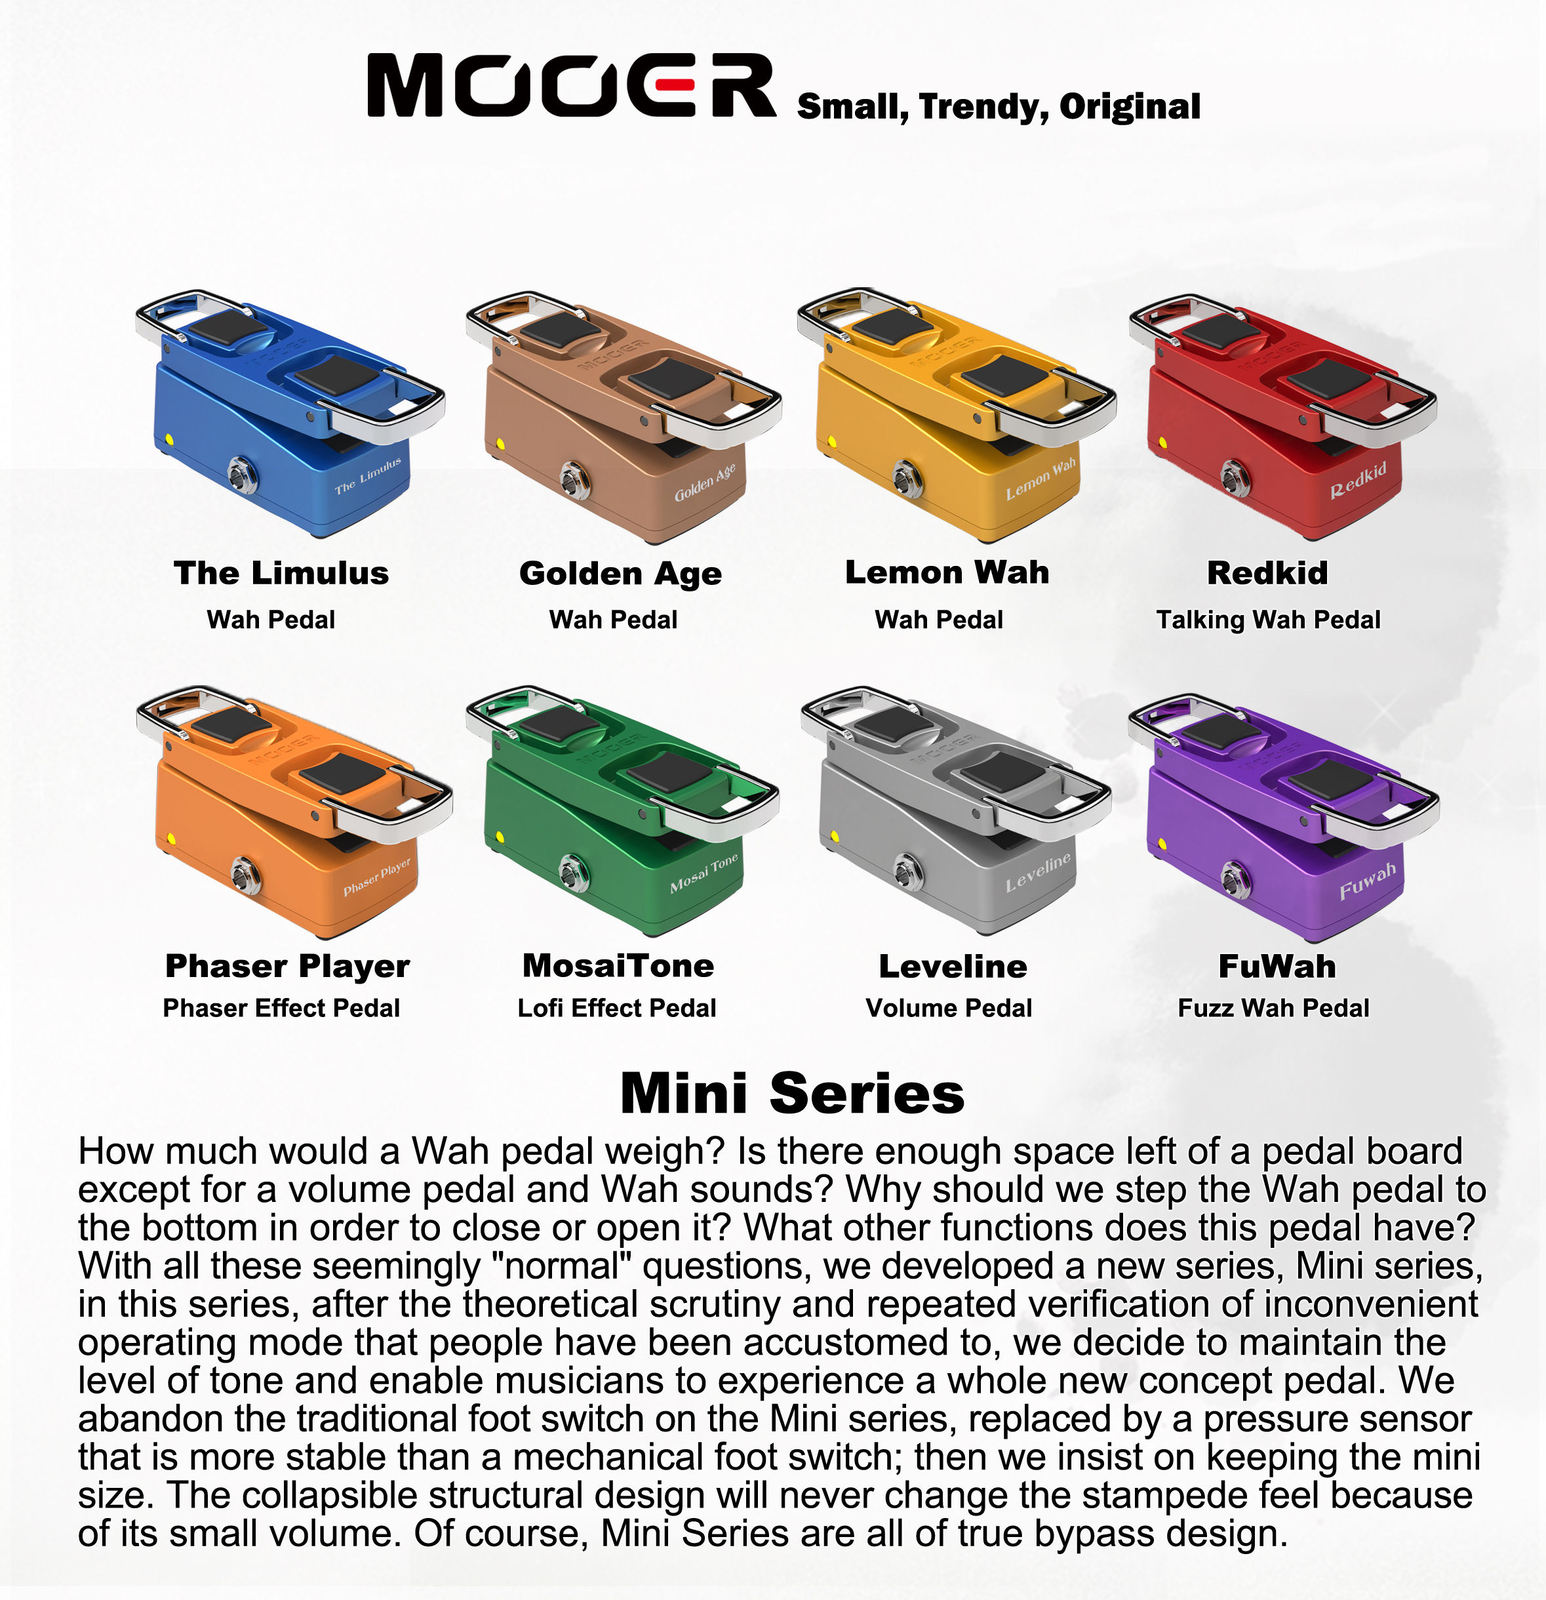 Mooer MMW Micro Series Compact 'The Wahter' Mini Wah Wah Guitar Effects Pedal